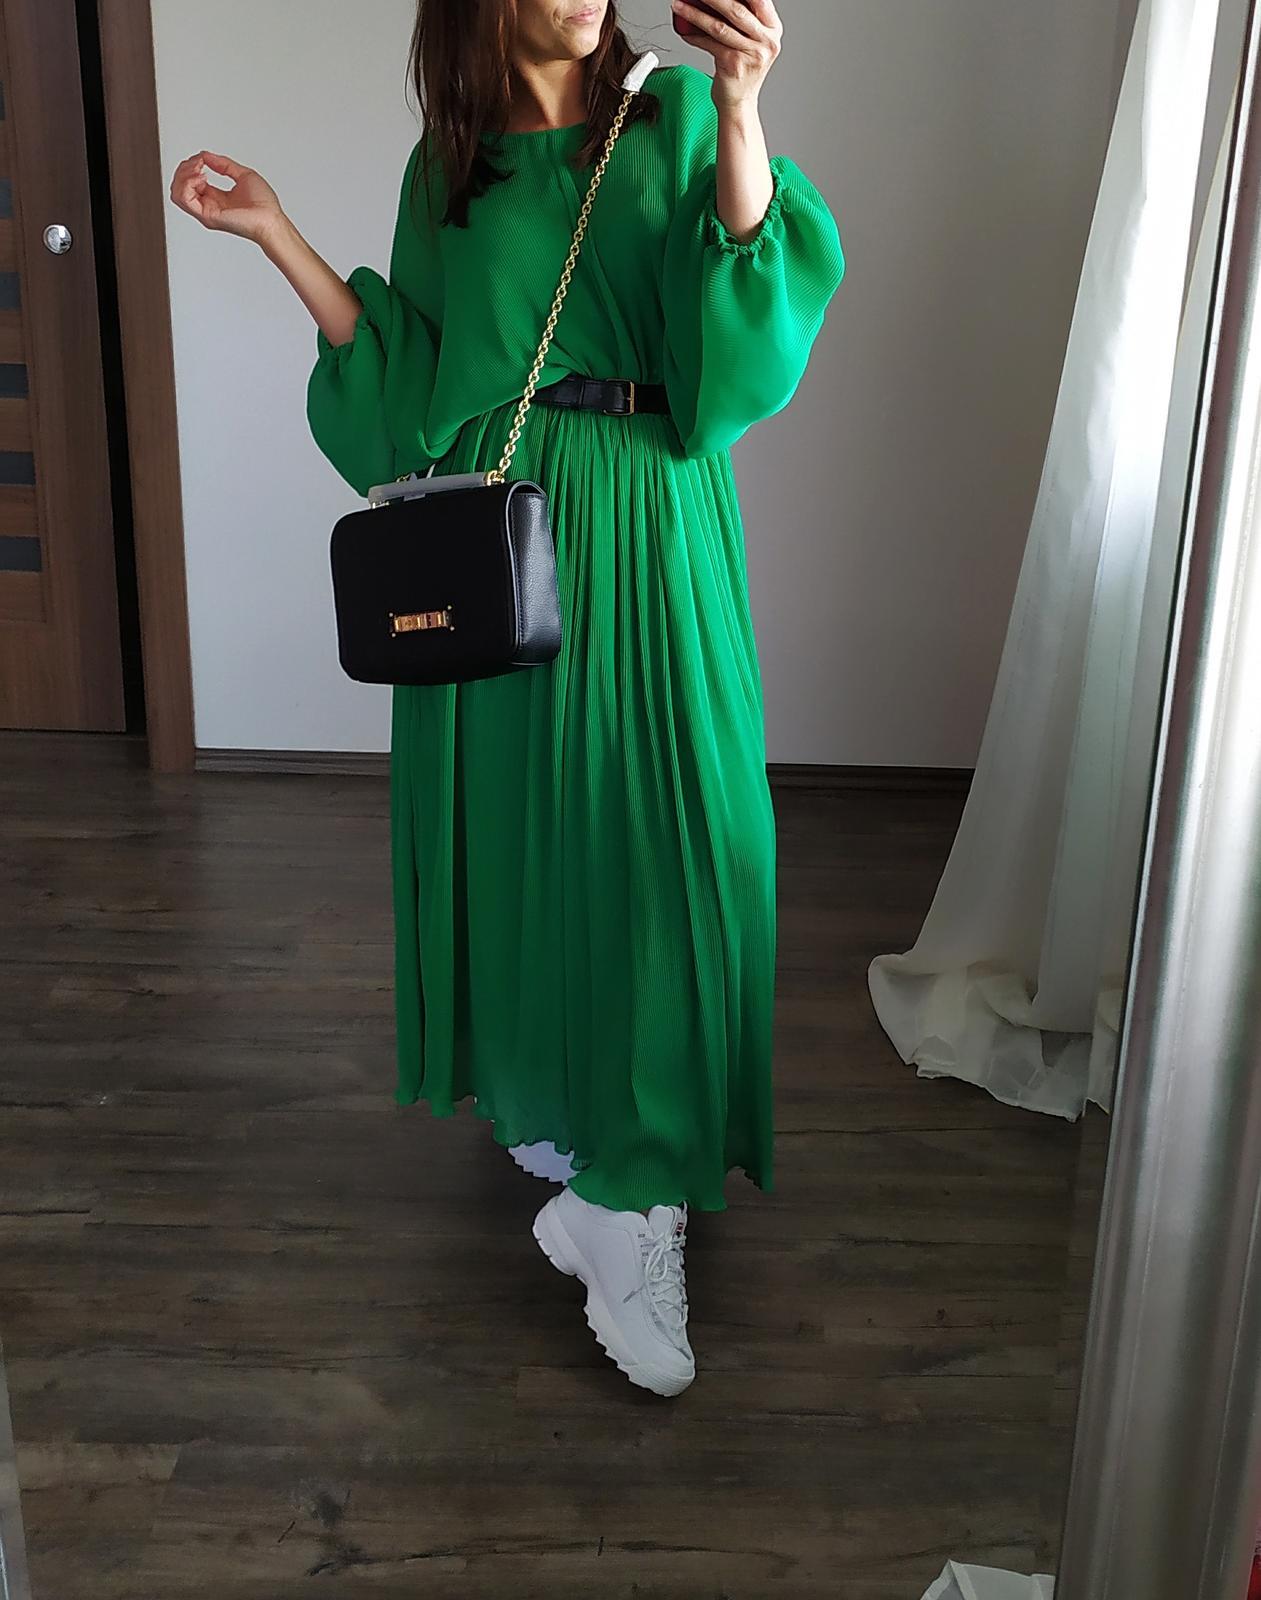 šaty Zara XS-S - Obrázek č. 2